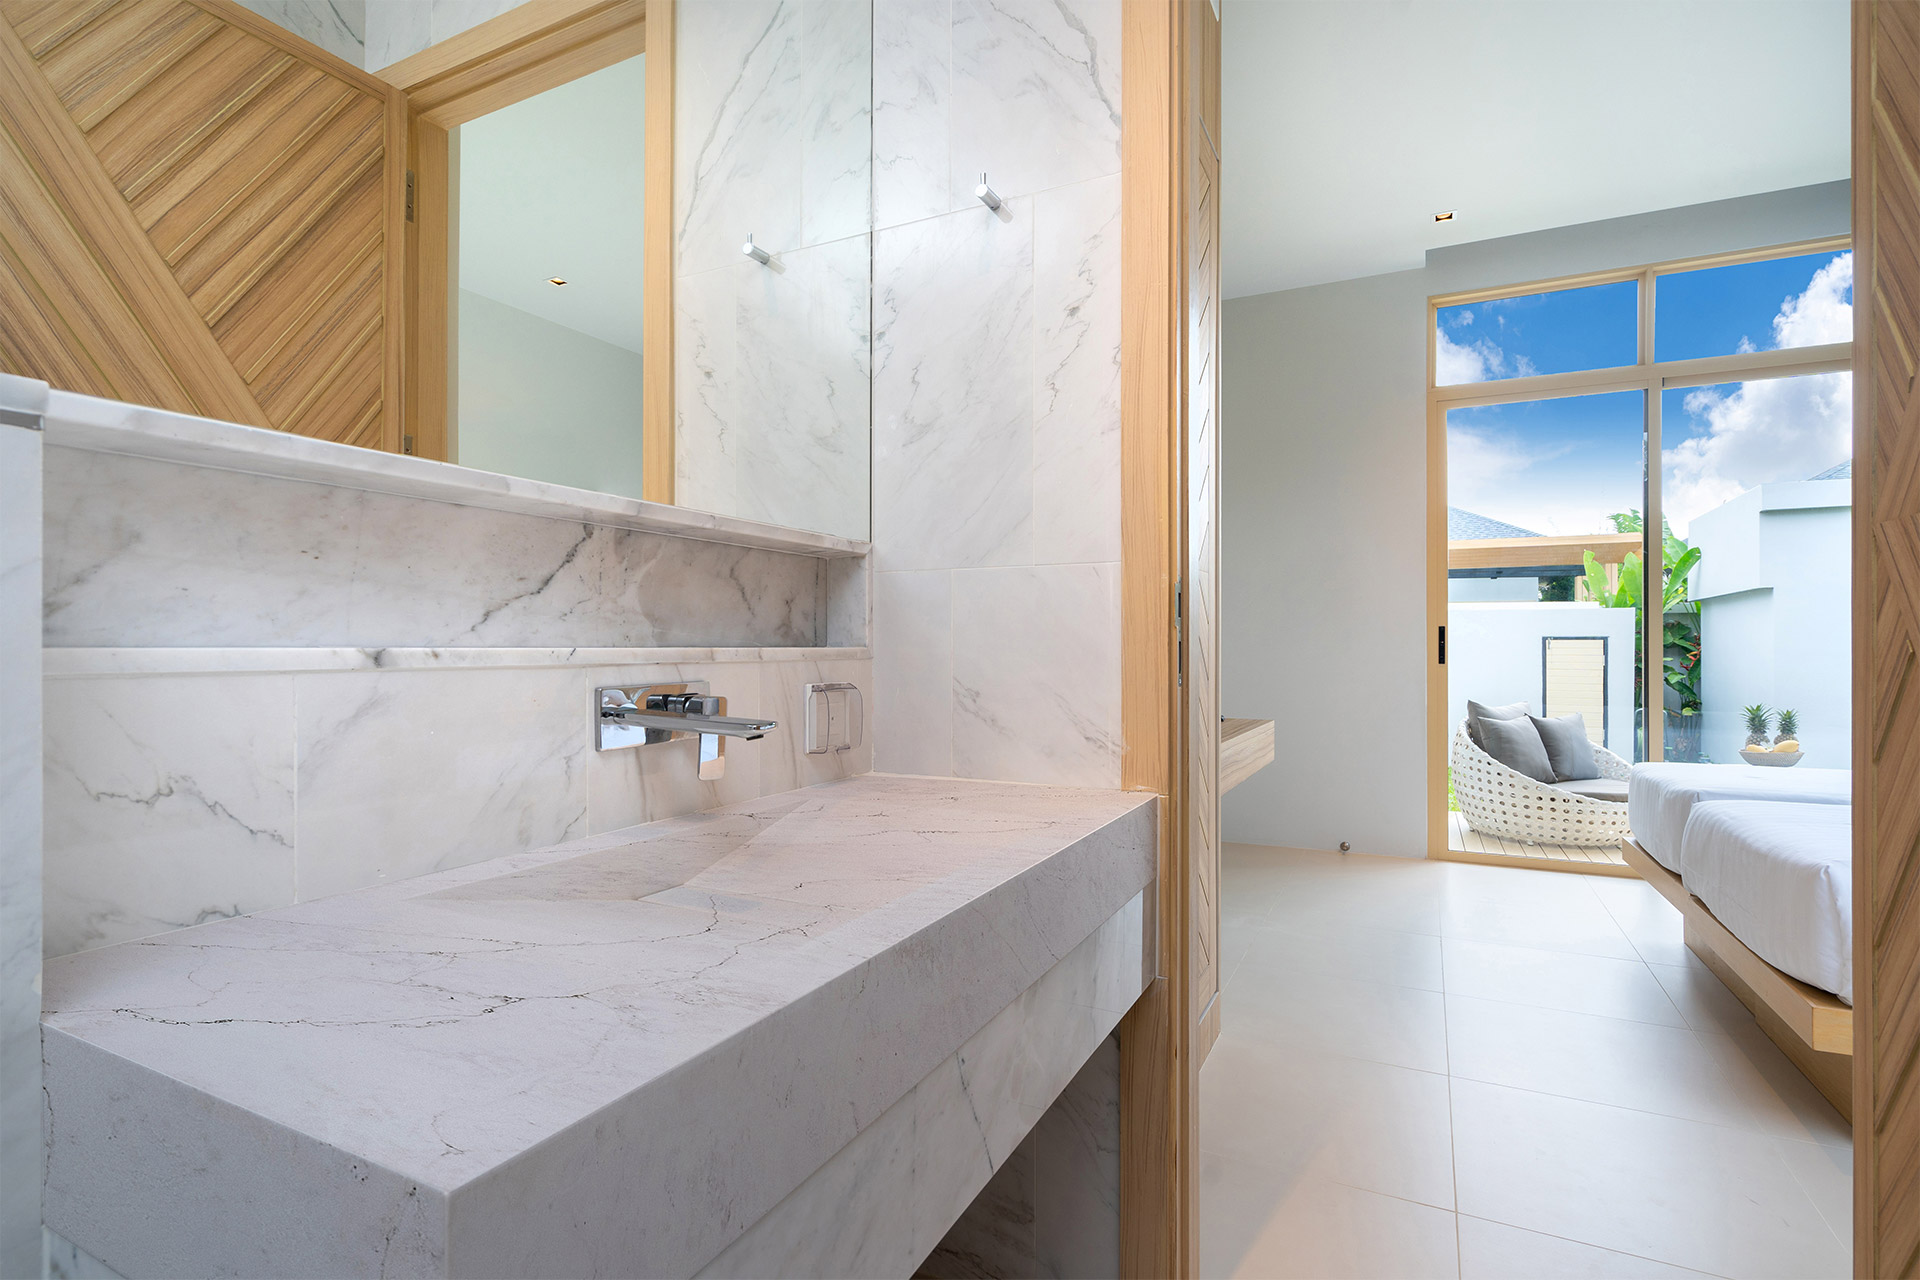 bathroom-neveSupreme-AQ9842-MonarchCollection